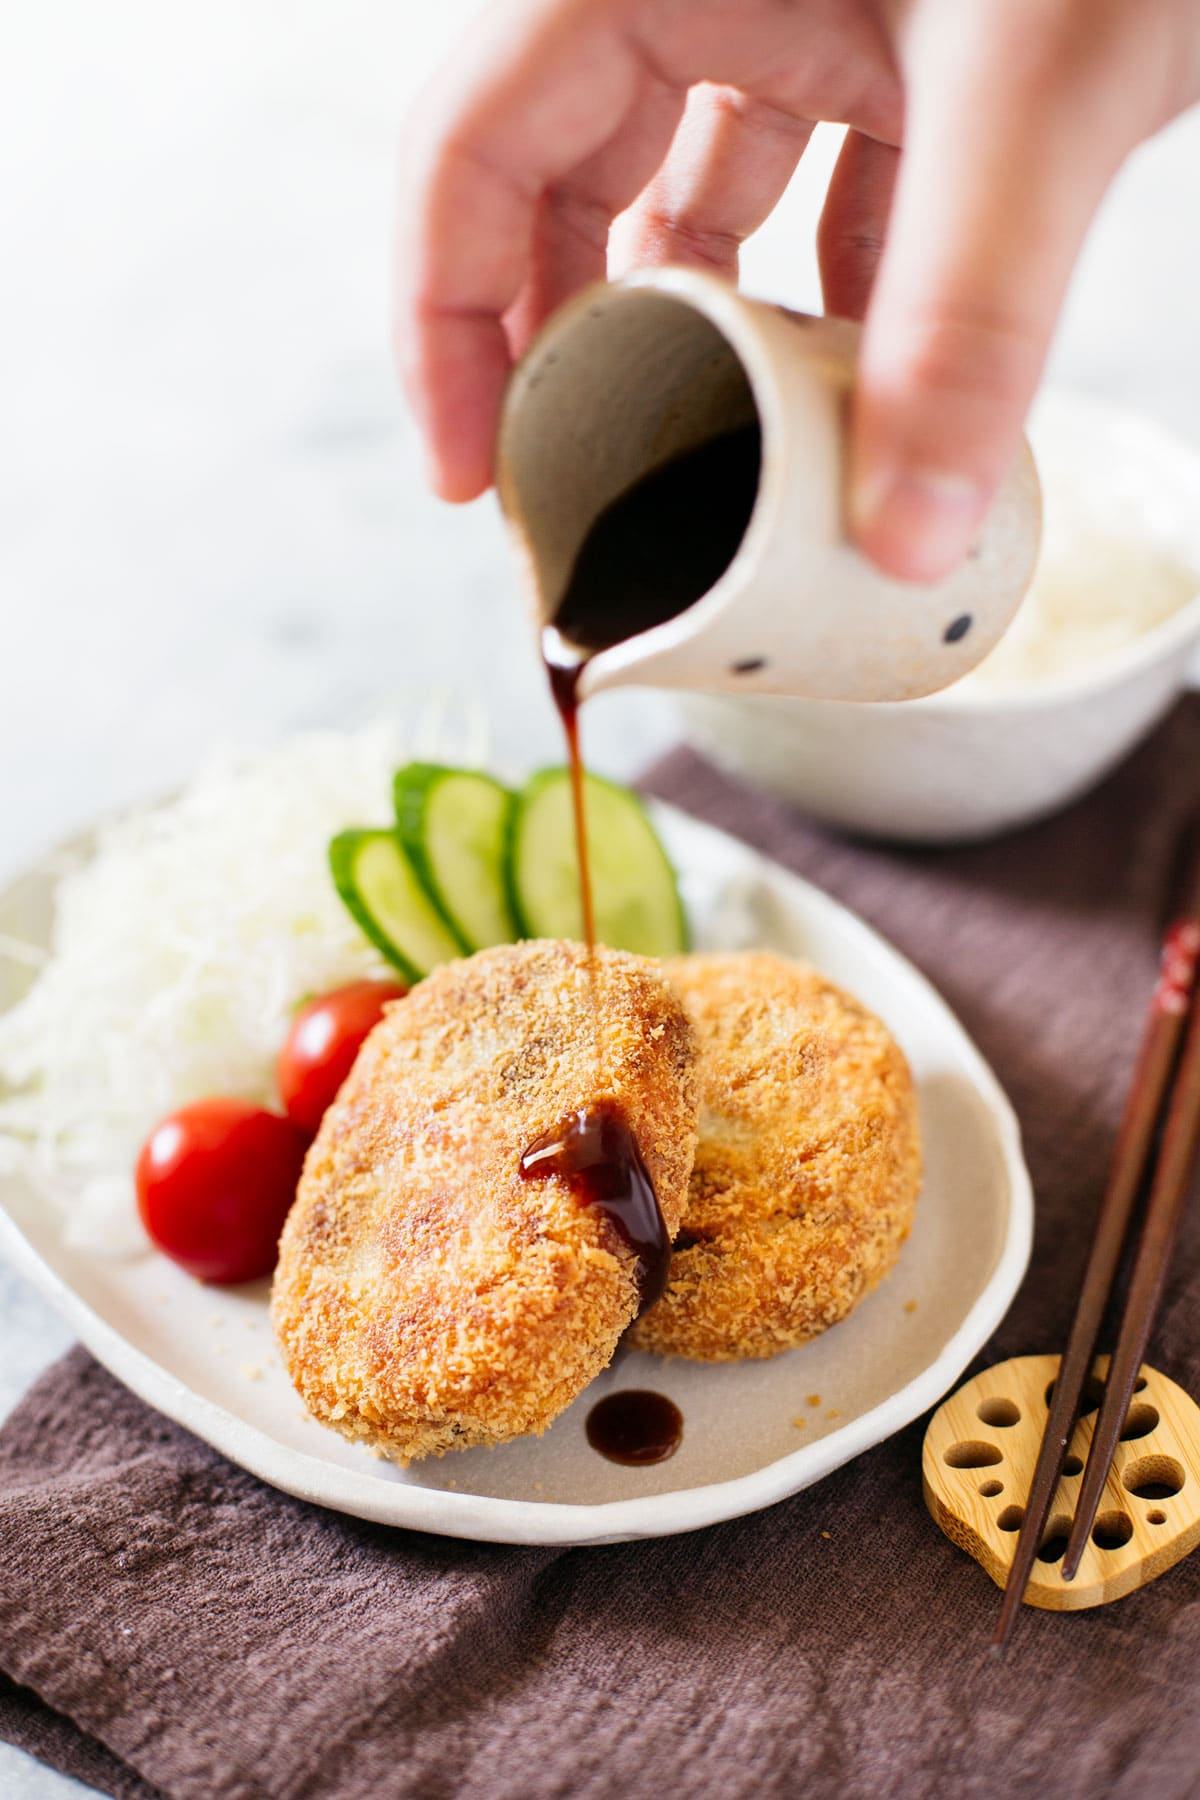 Tonkatsu sauce poured over Japanese potato croquettes